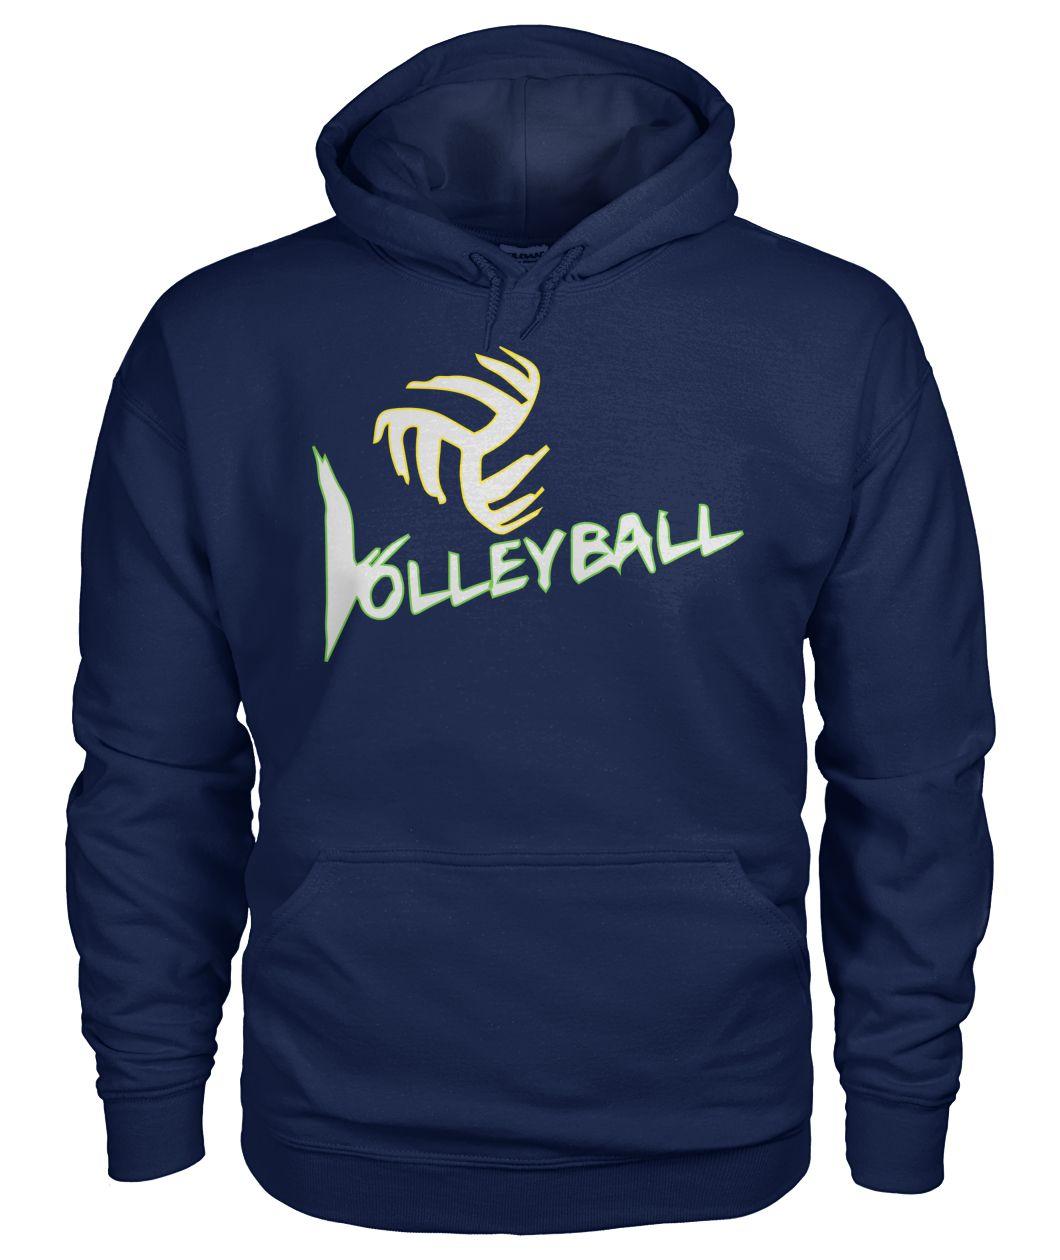 Volleyball Heartbeat Ltd Edition T Shirt Costumes Kids Tee Shirts Sports Tees